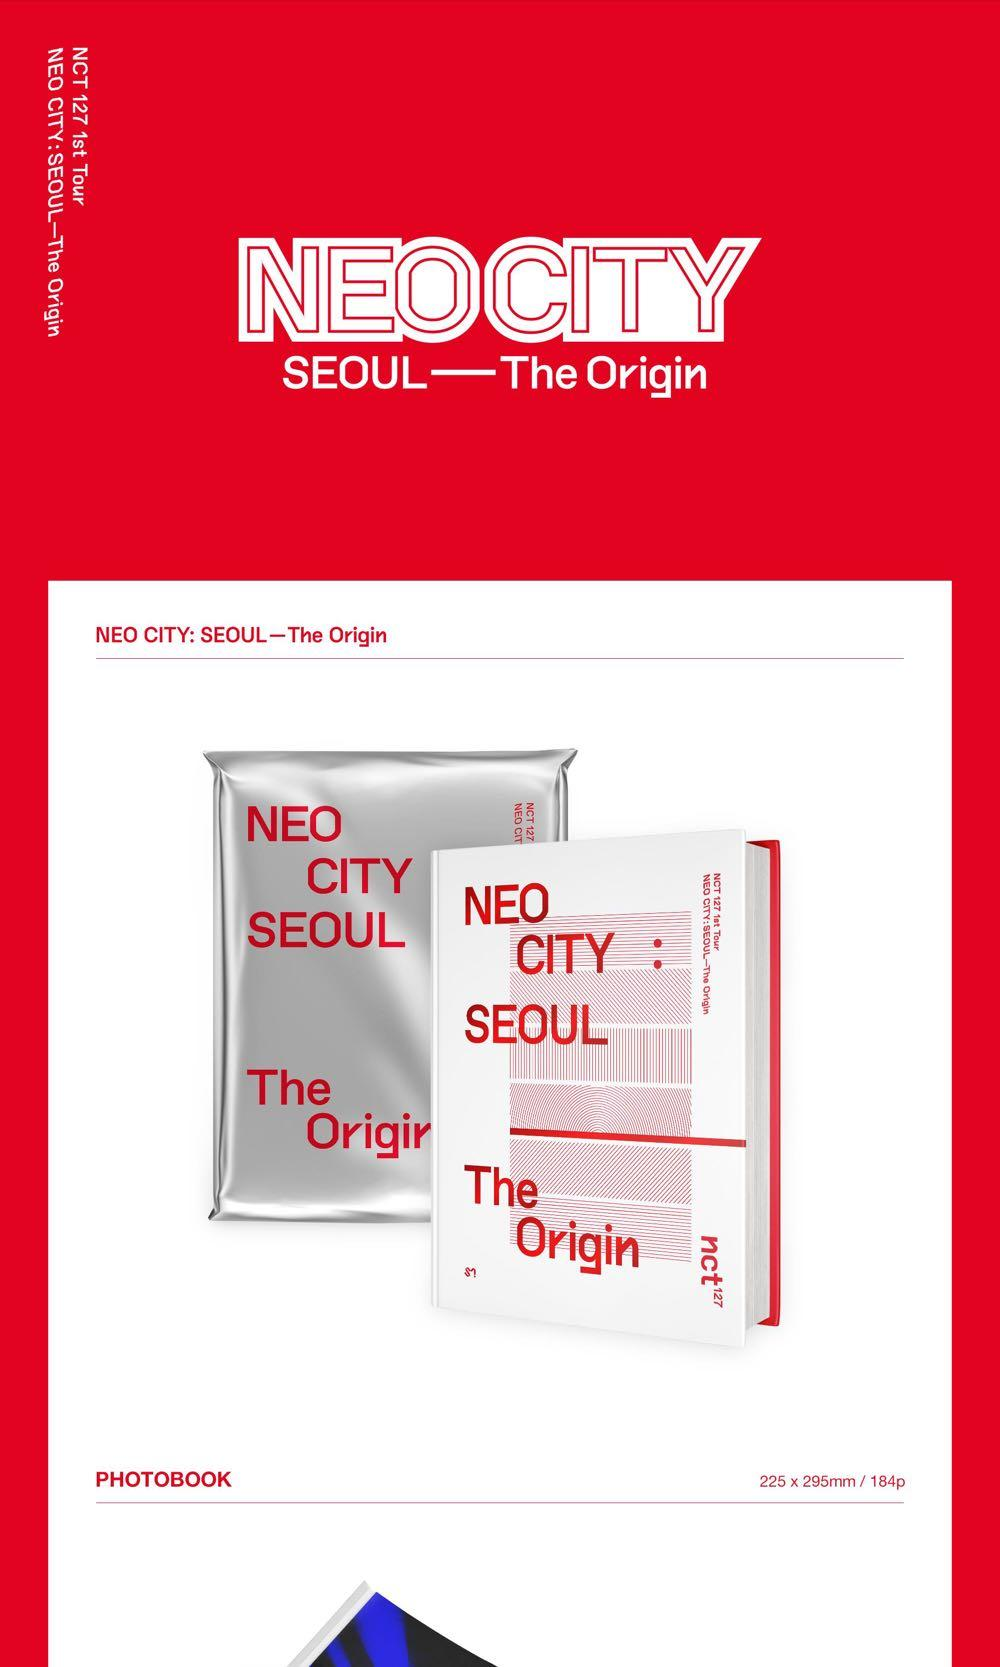 NCT127 - Nct127 1st Tour Neo City: Seoul - The Origin